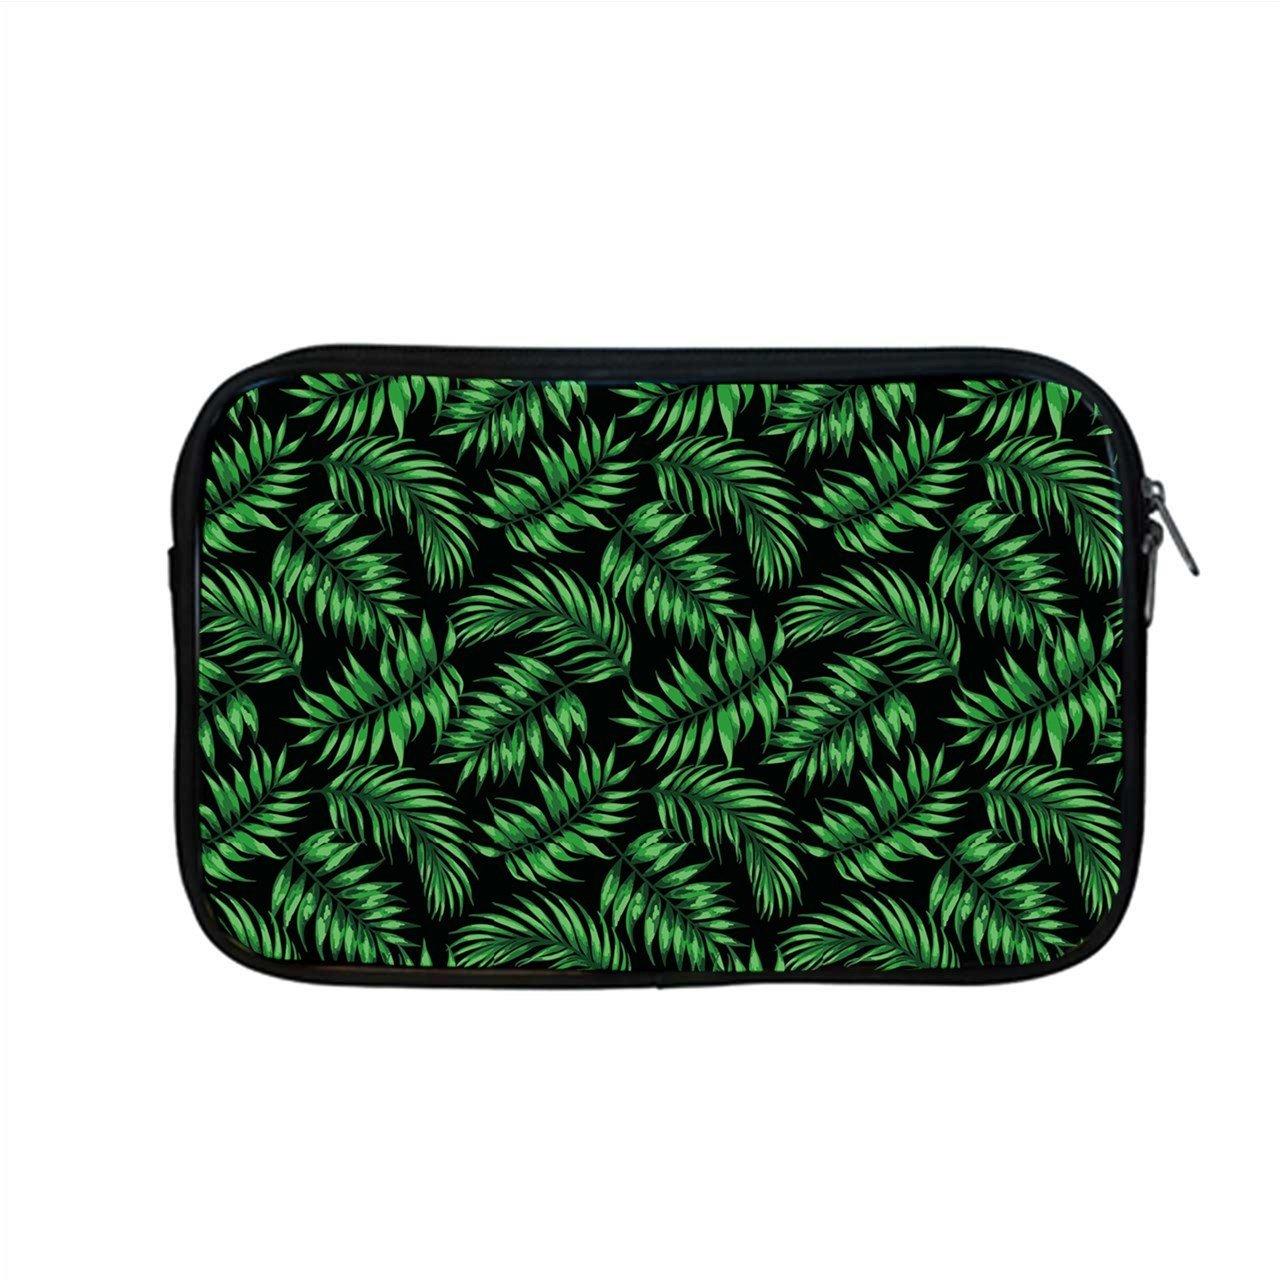 "Exotic Leaves Apple MacBook Pro 13"" Zipper Case"